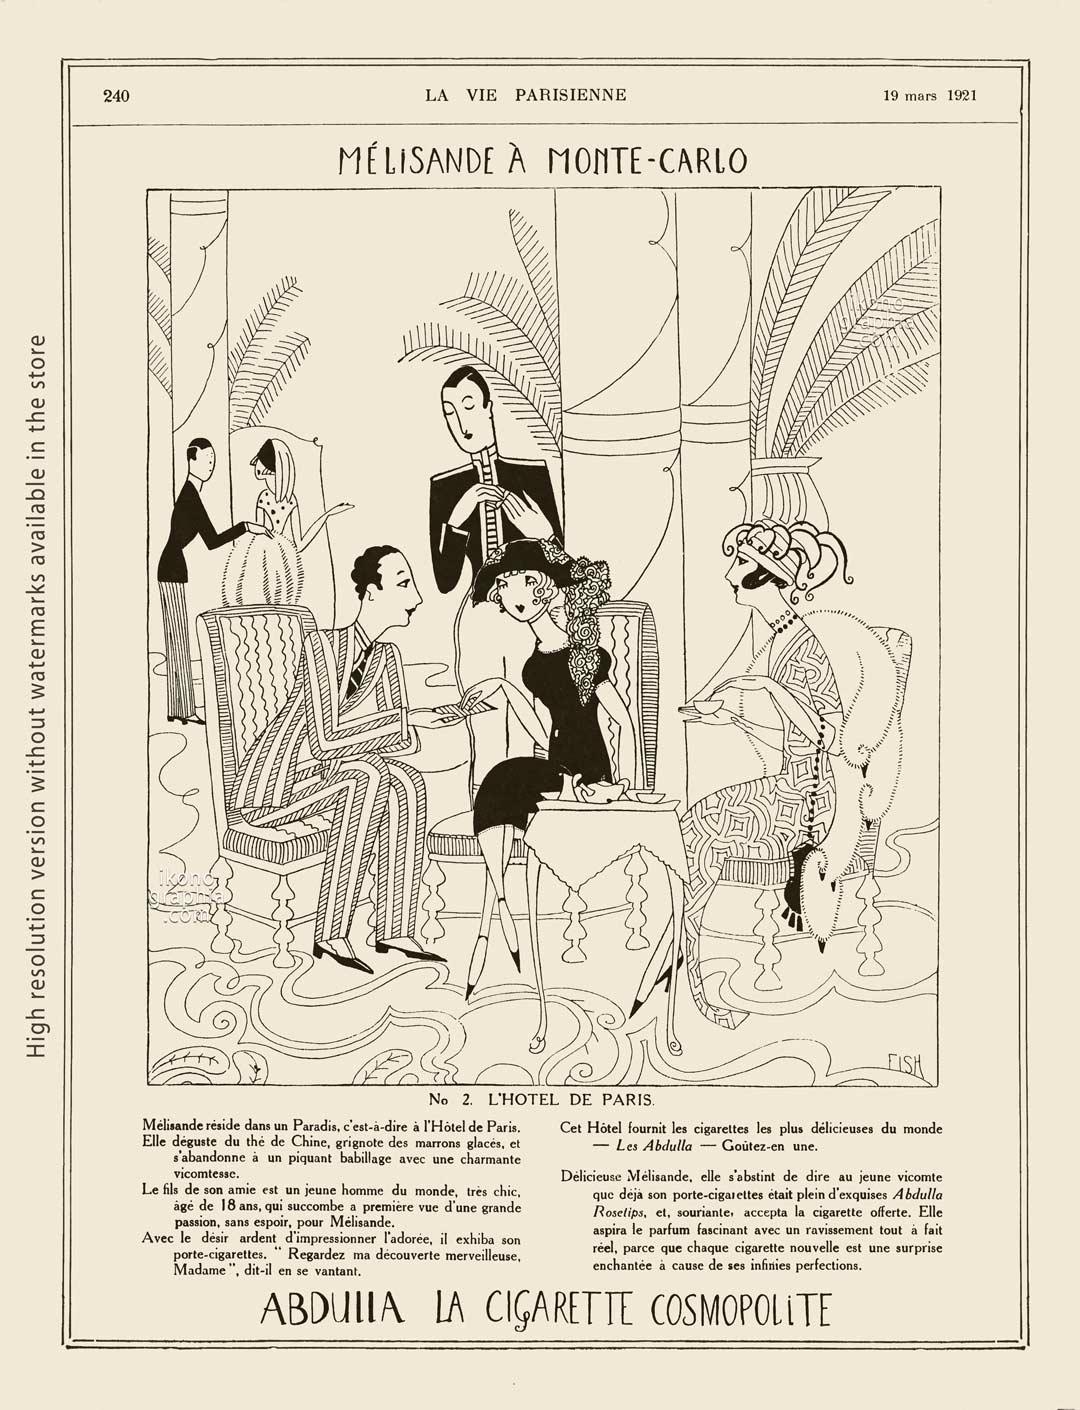 Abdulla Cigarettes Ad - Melisande at Montecarlo. No. 2. L'HOTEL DE PARIS. La Vie Parisienne. March 19, 1921. Artwork by Anne Harriet Fish.